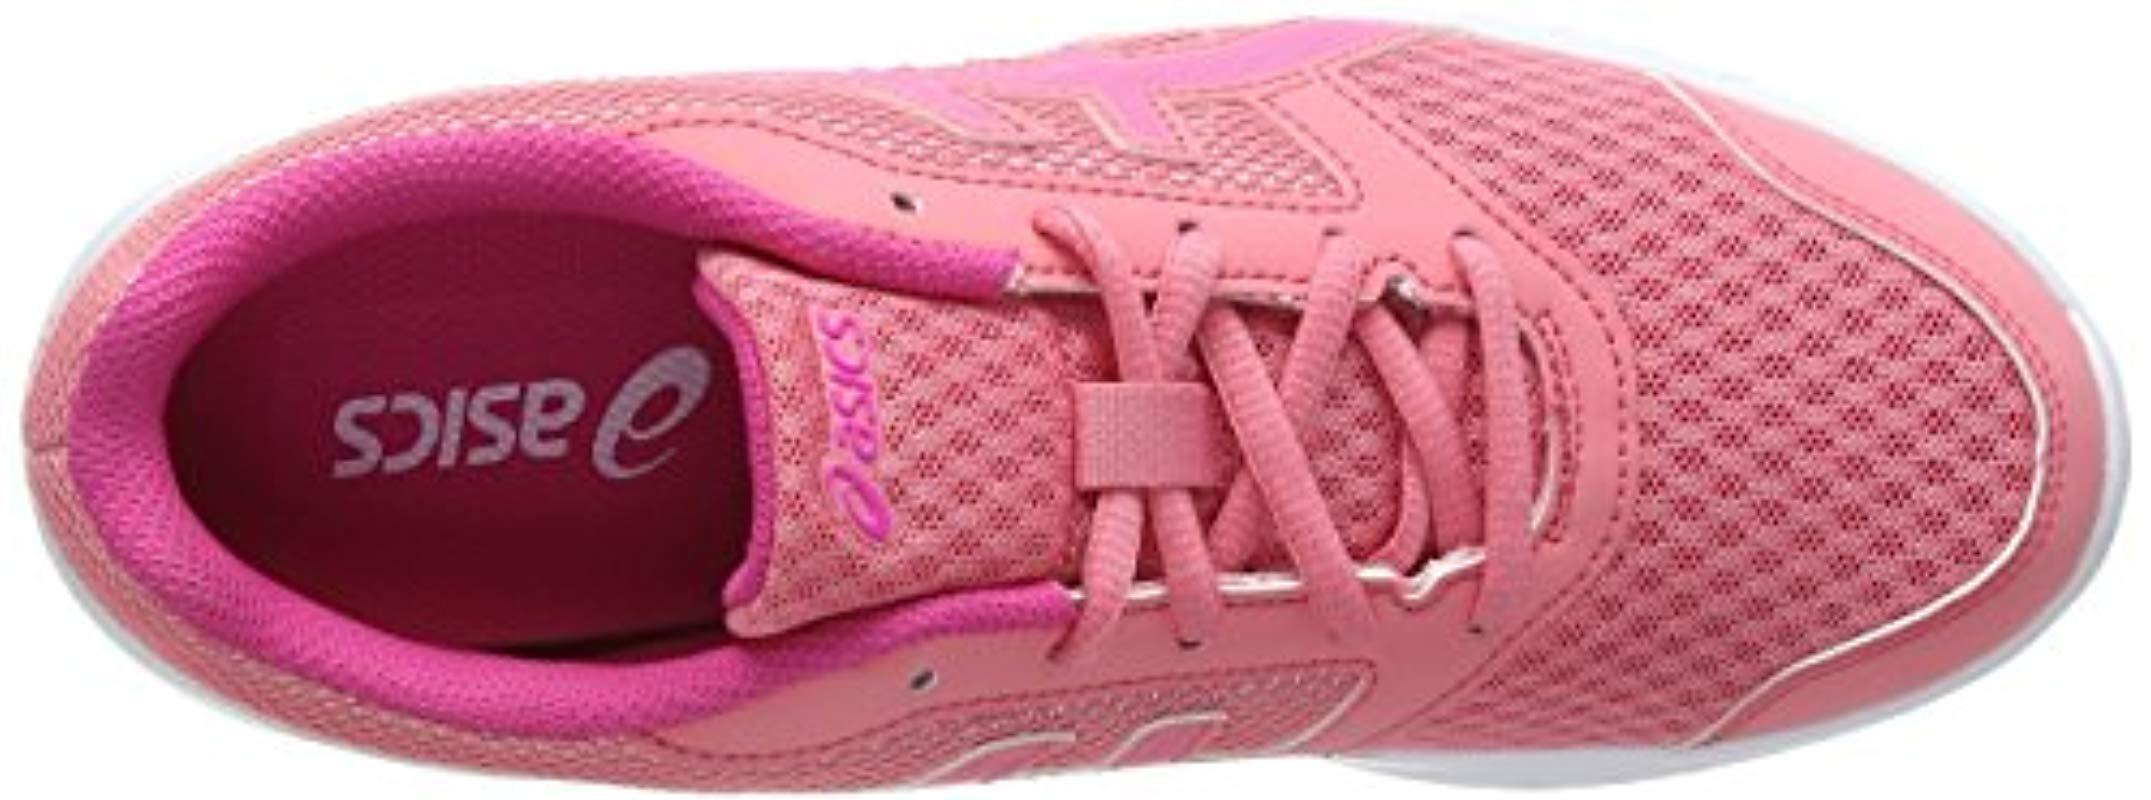 7d2cdf4eb03a Asics - Pink Stormer 2 Running Shoes Black - Lyst. View fullscreen